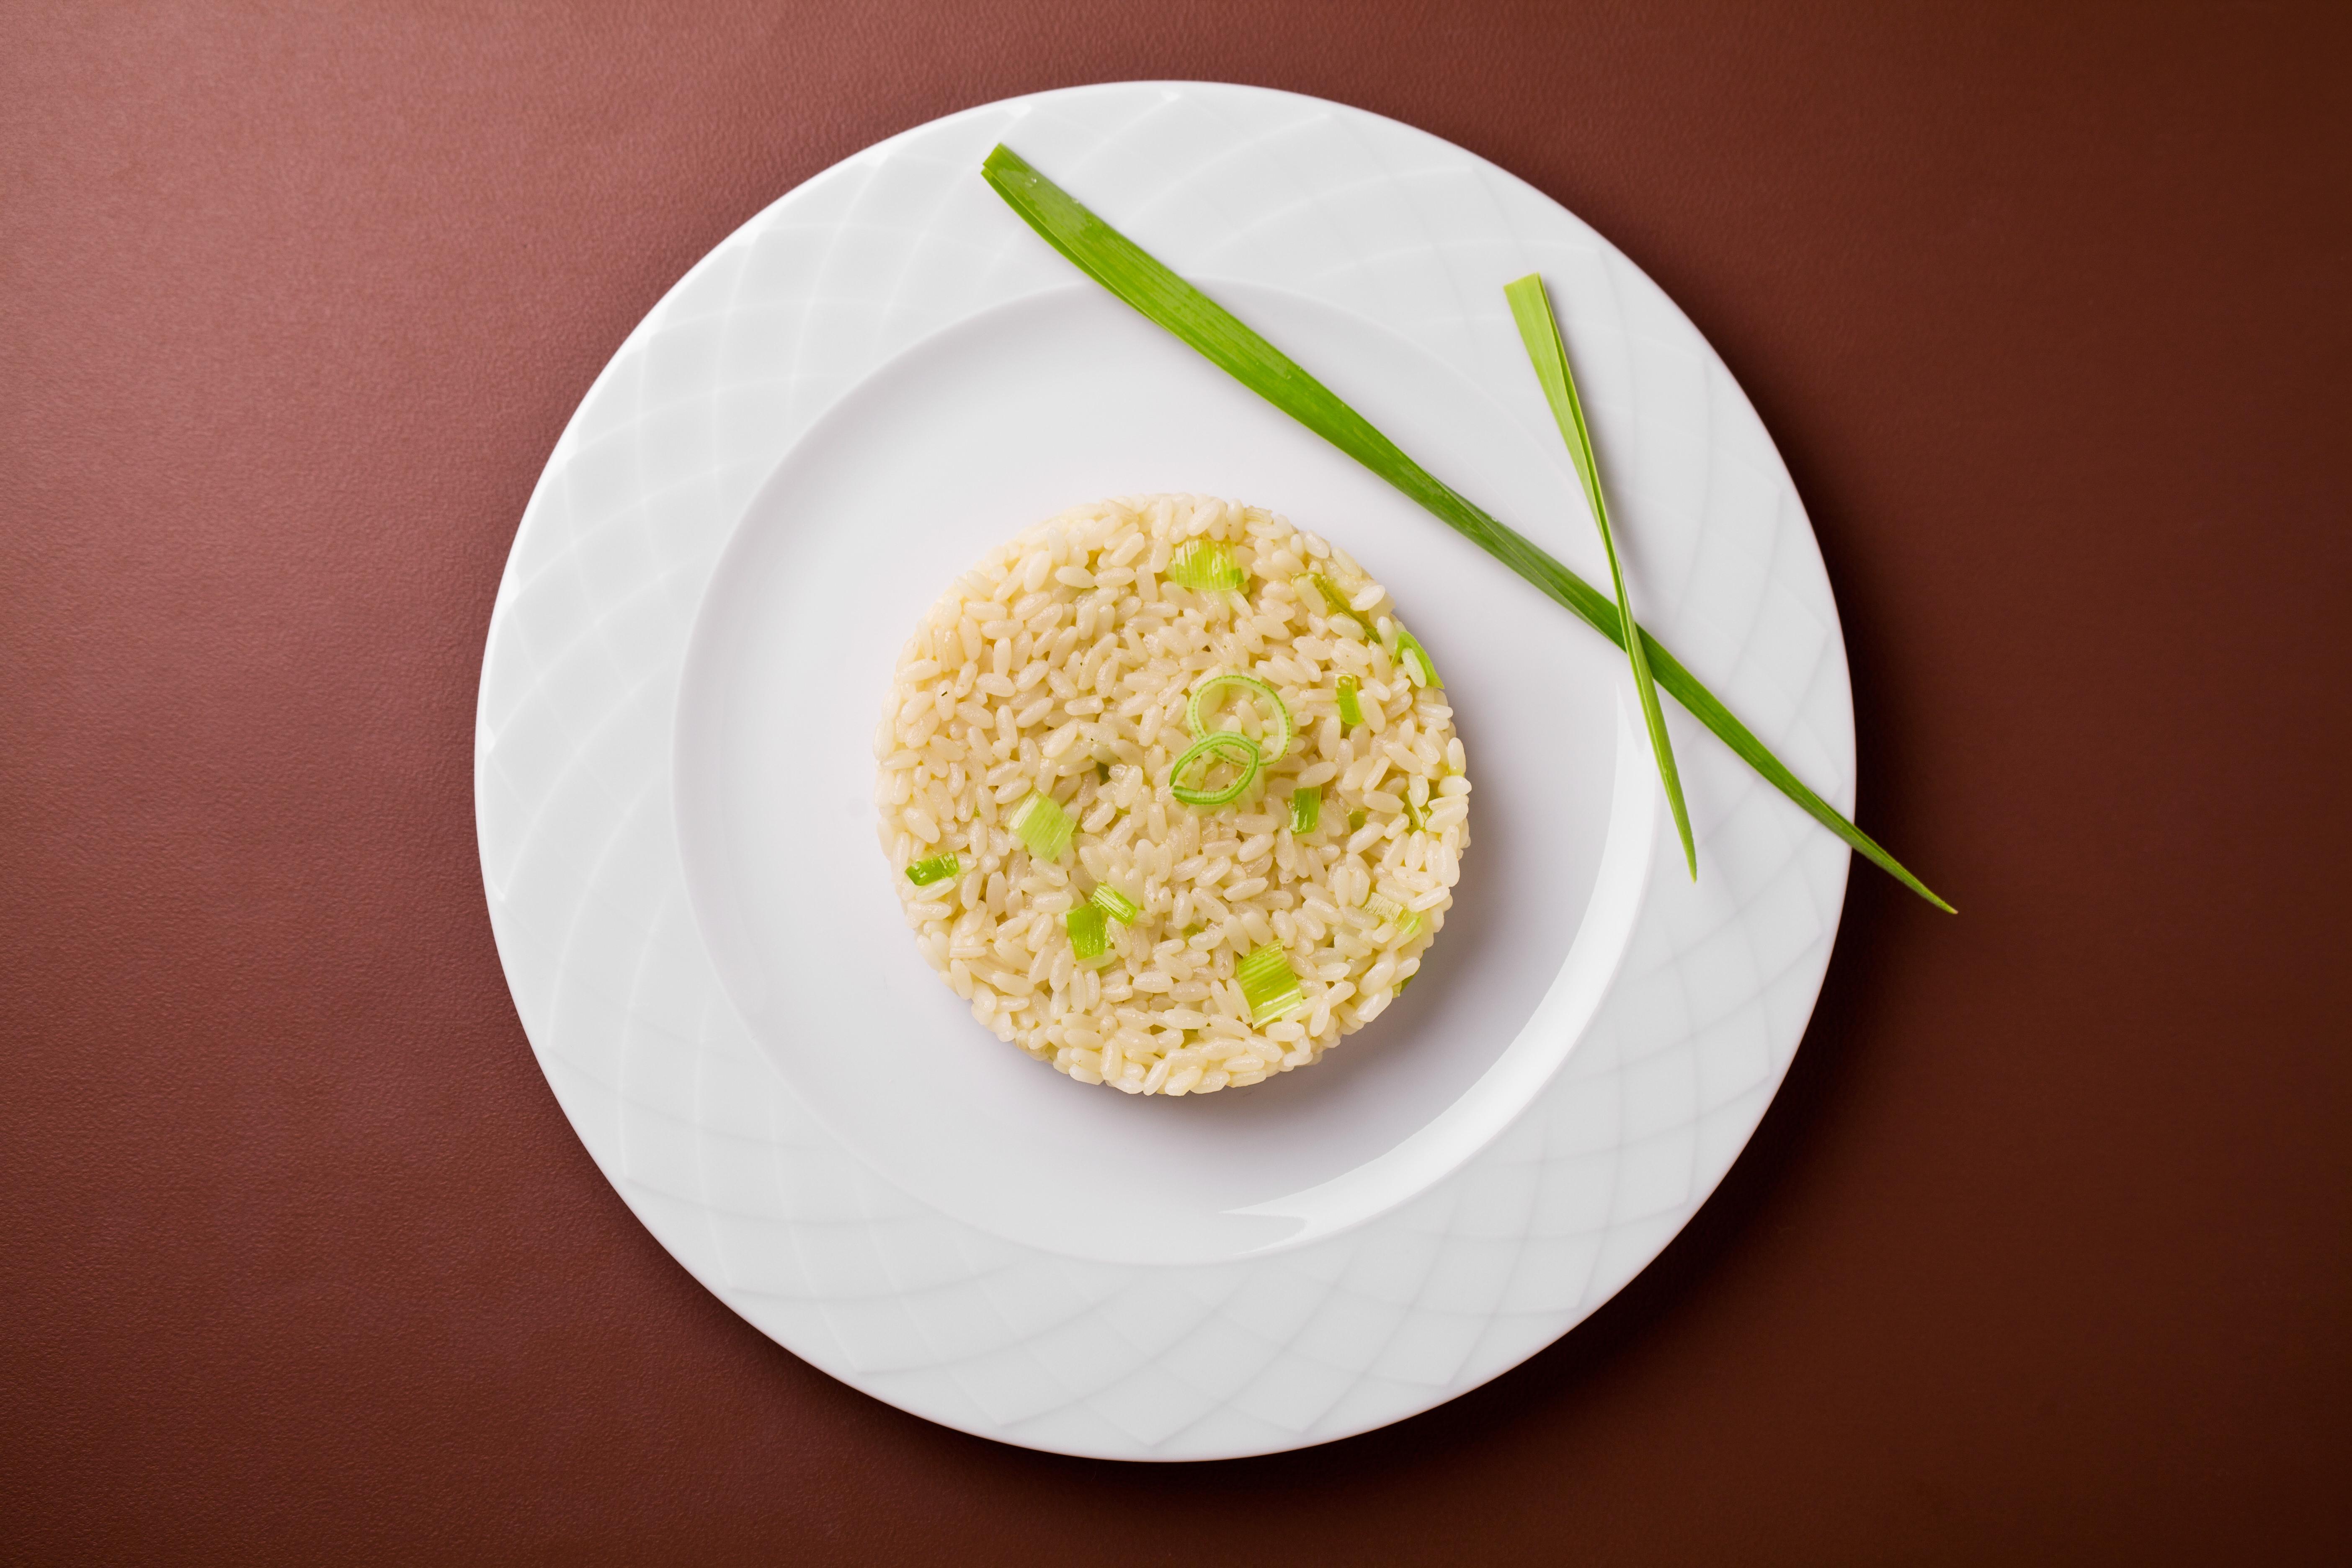 Recipe for prosorizo greek style leeks and rice greek style leeks and rice prasorizo recipe ingredients forumfinder Images